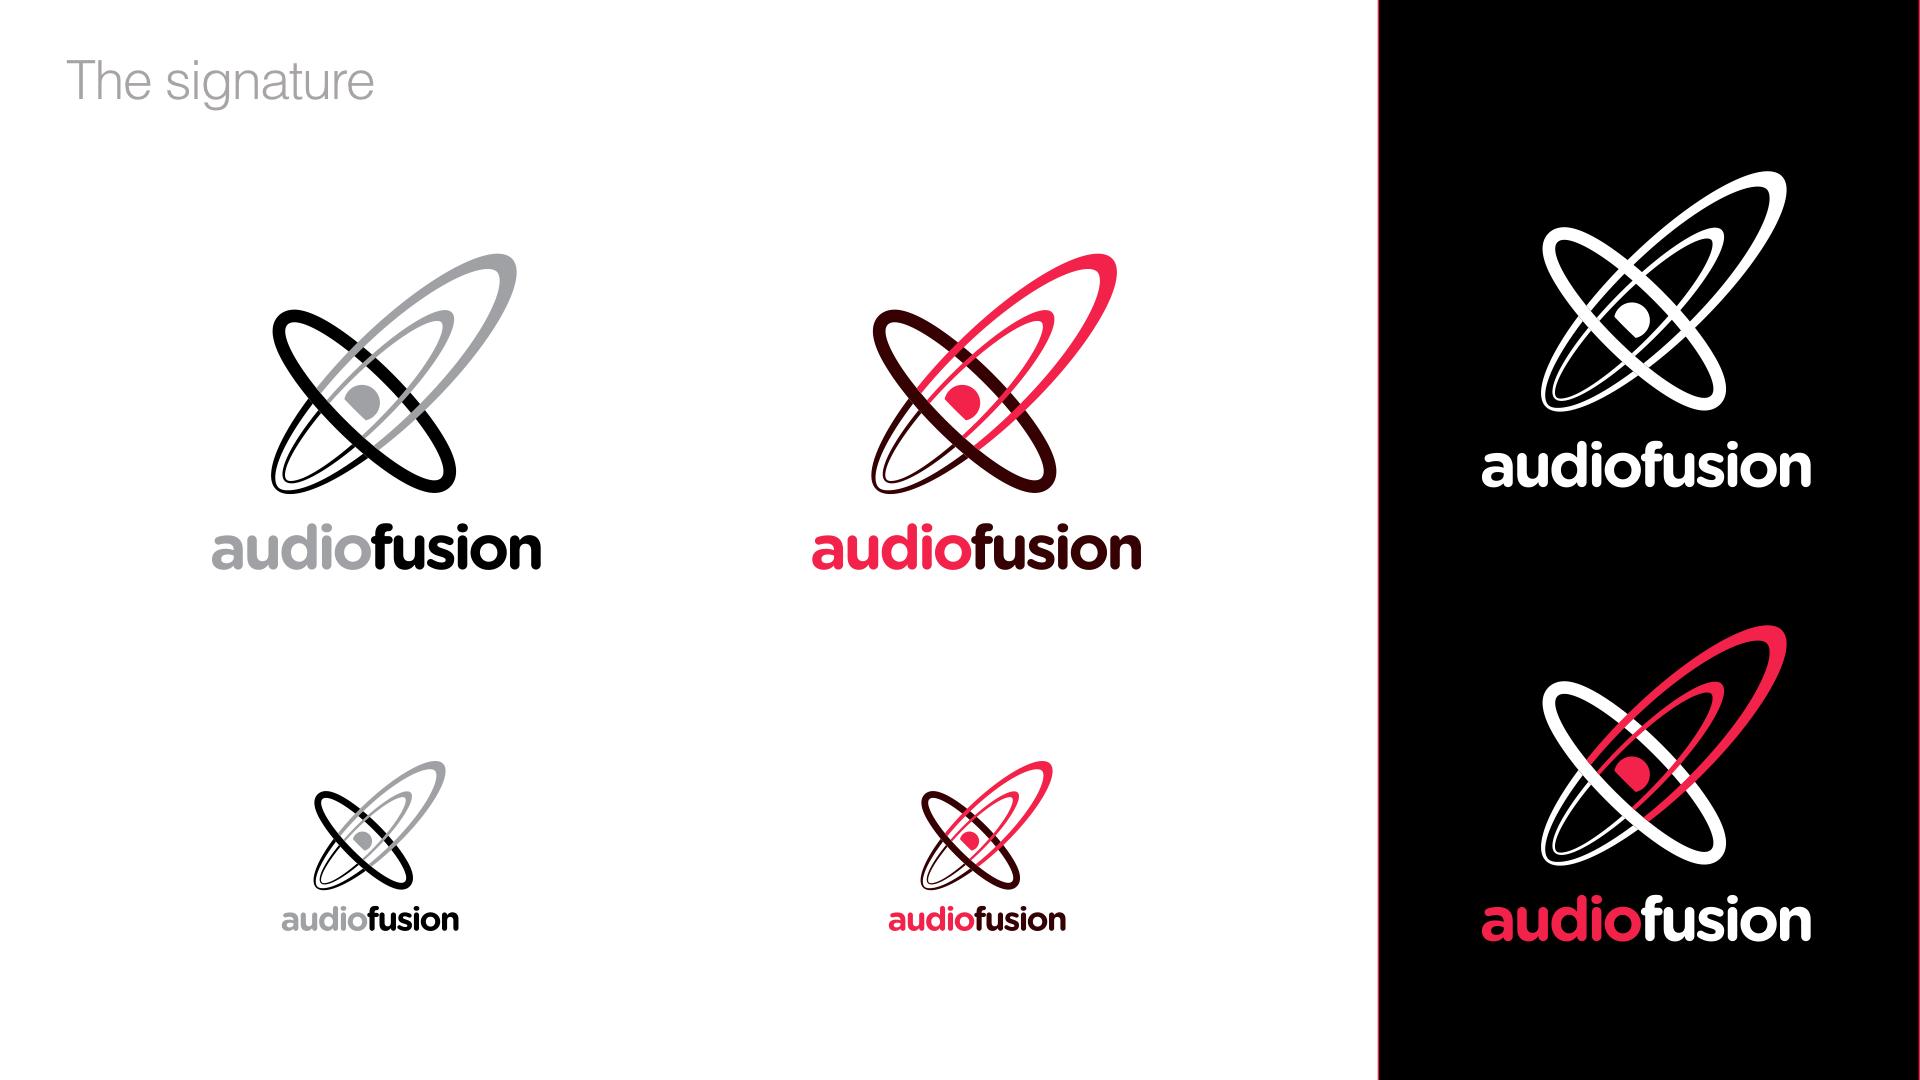 audioFusion_branding_portfolio_.007.png